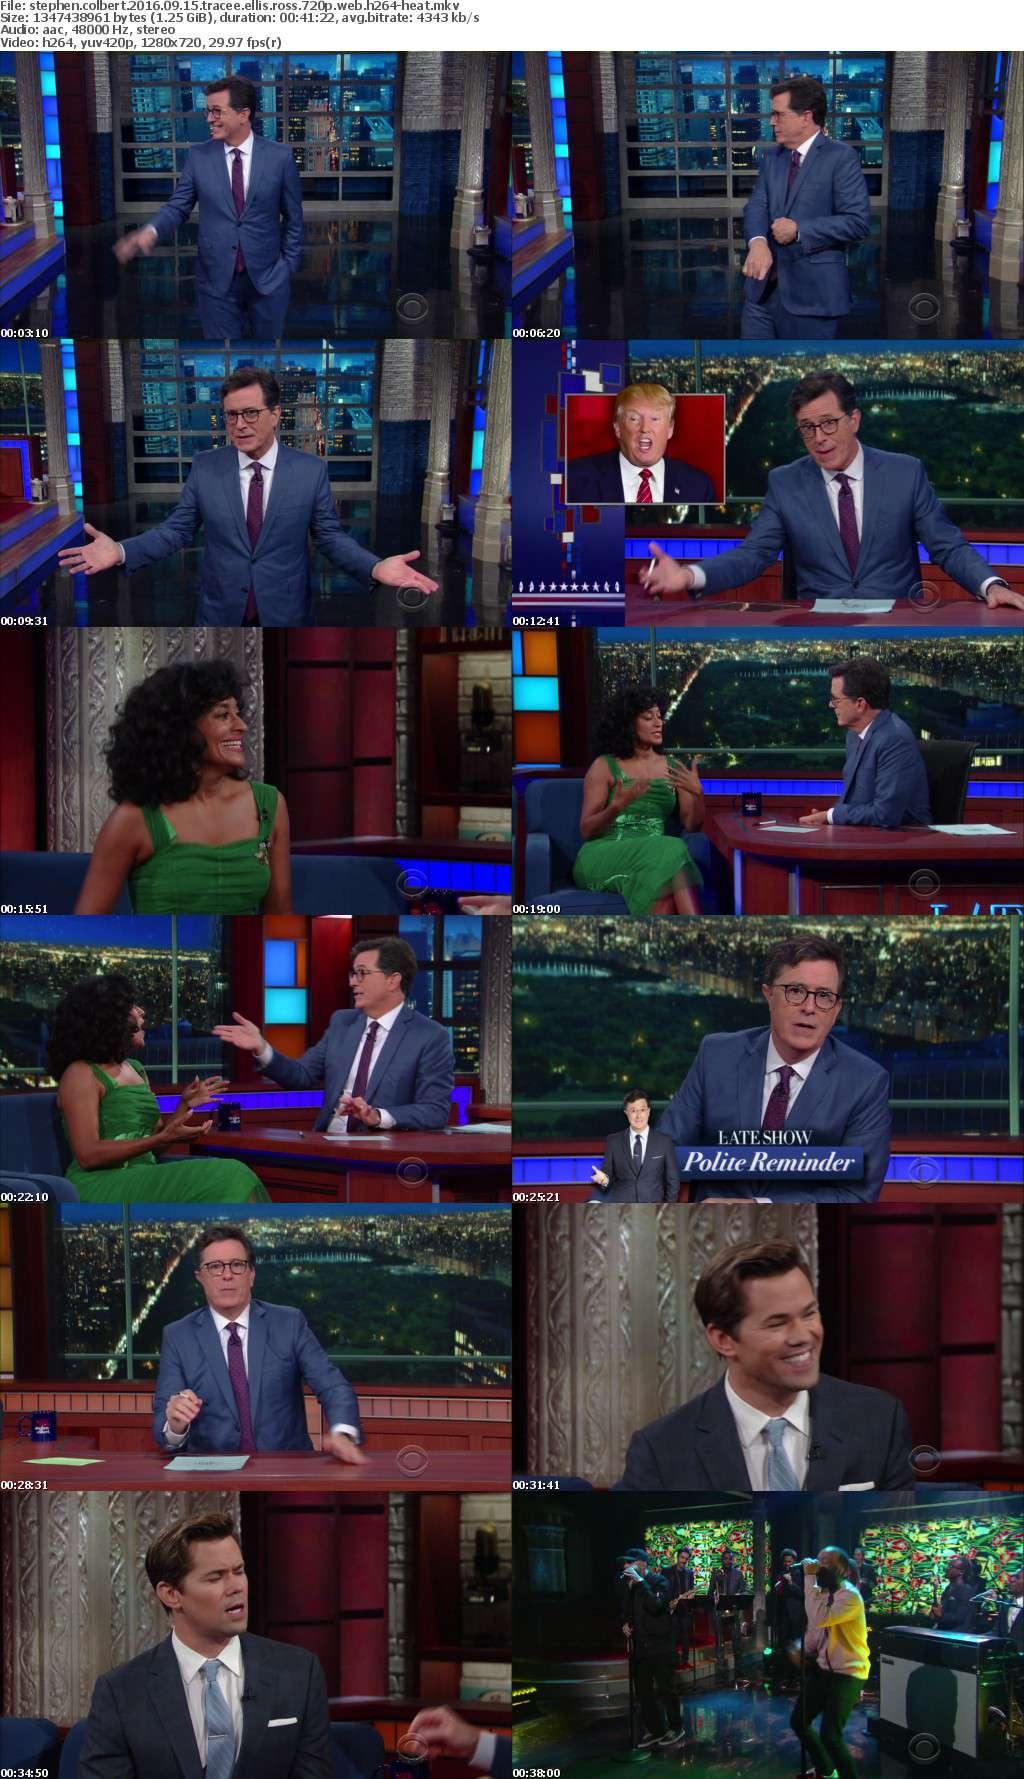 Stephen Colbert 2016 09 15 Tracee Ellis Ross 720p WEB h264-HEAT